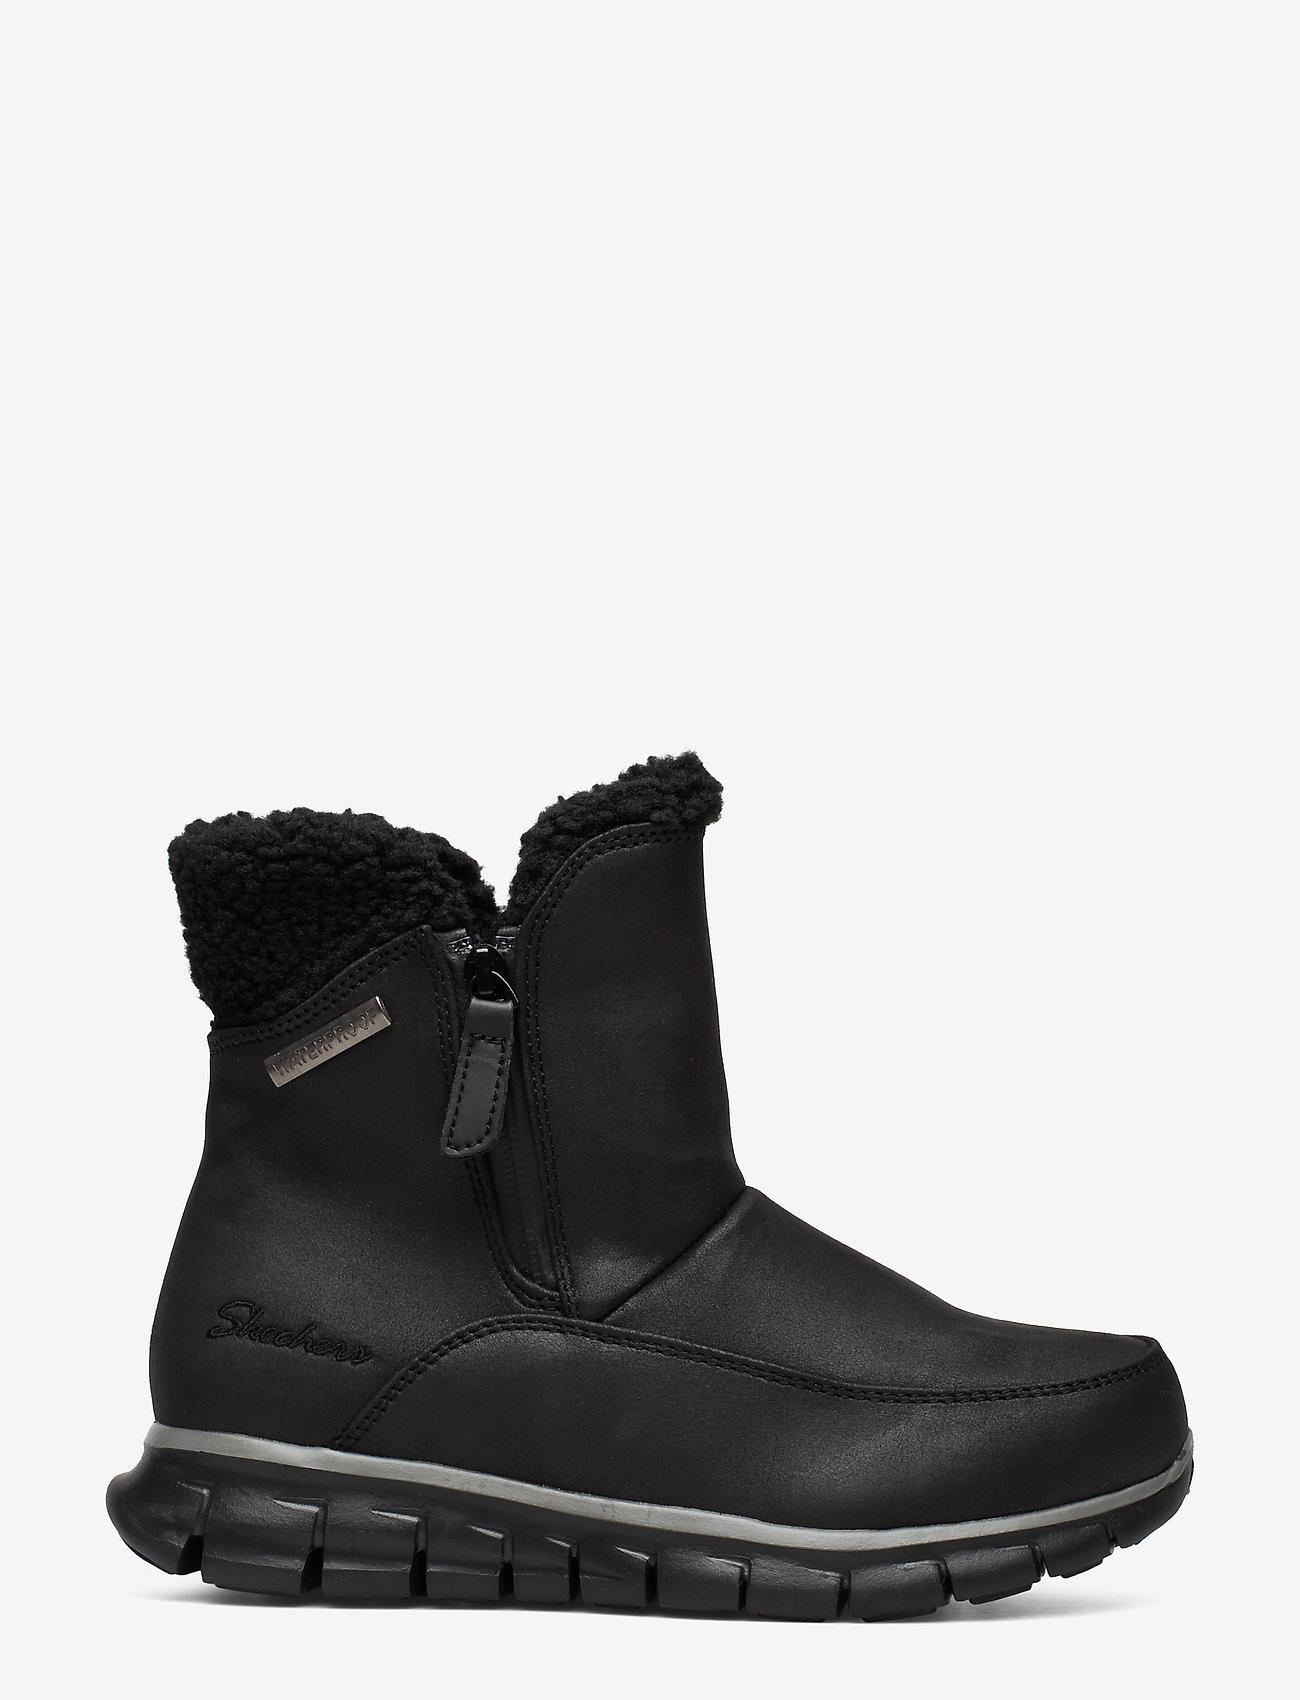 Skechers - Womens Synergy - Waterproof - flade ankelstøvler - bbk black - 0